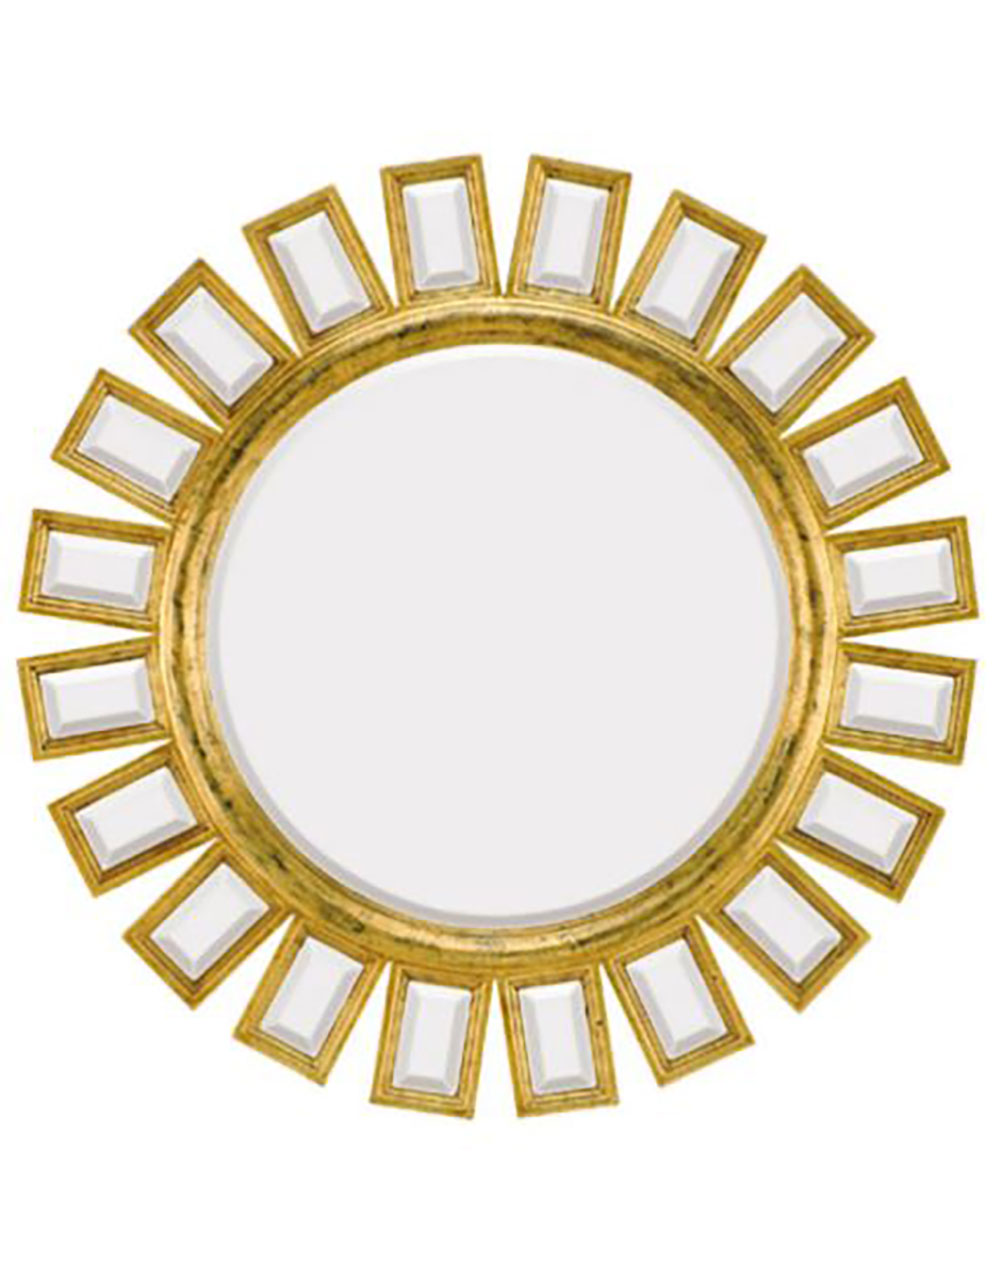 Majestic Mirror Round Gold Ornate Bevel Glass Decorative Mirror 34in ...